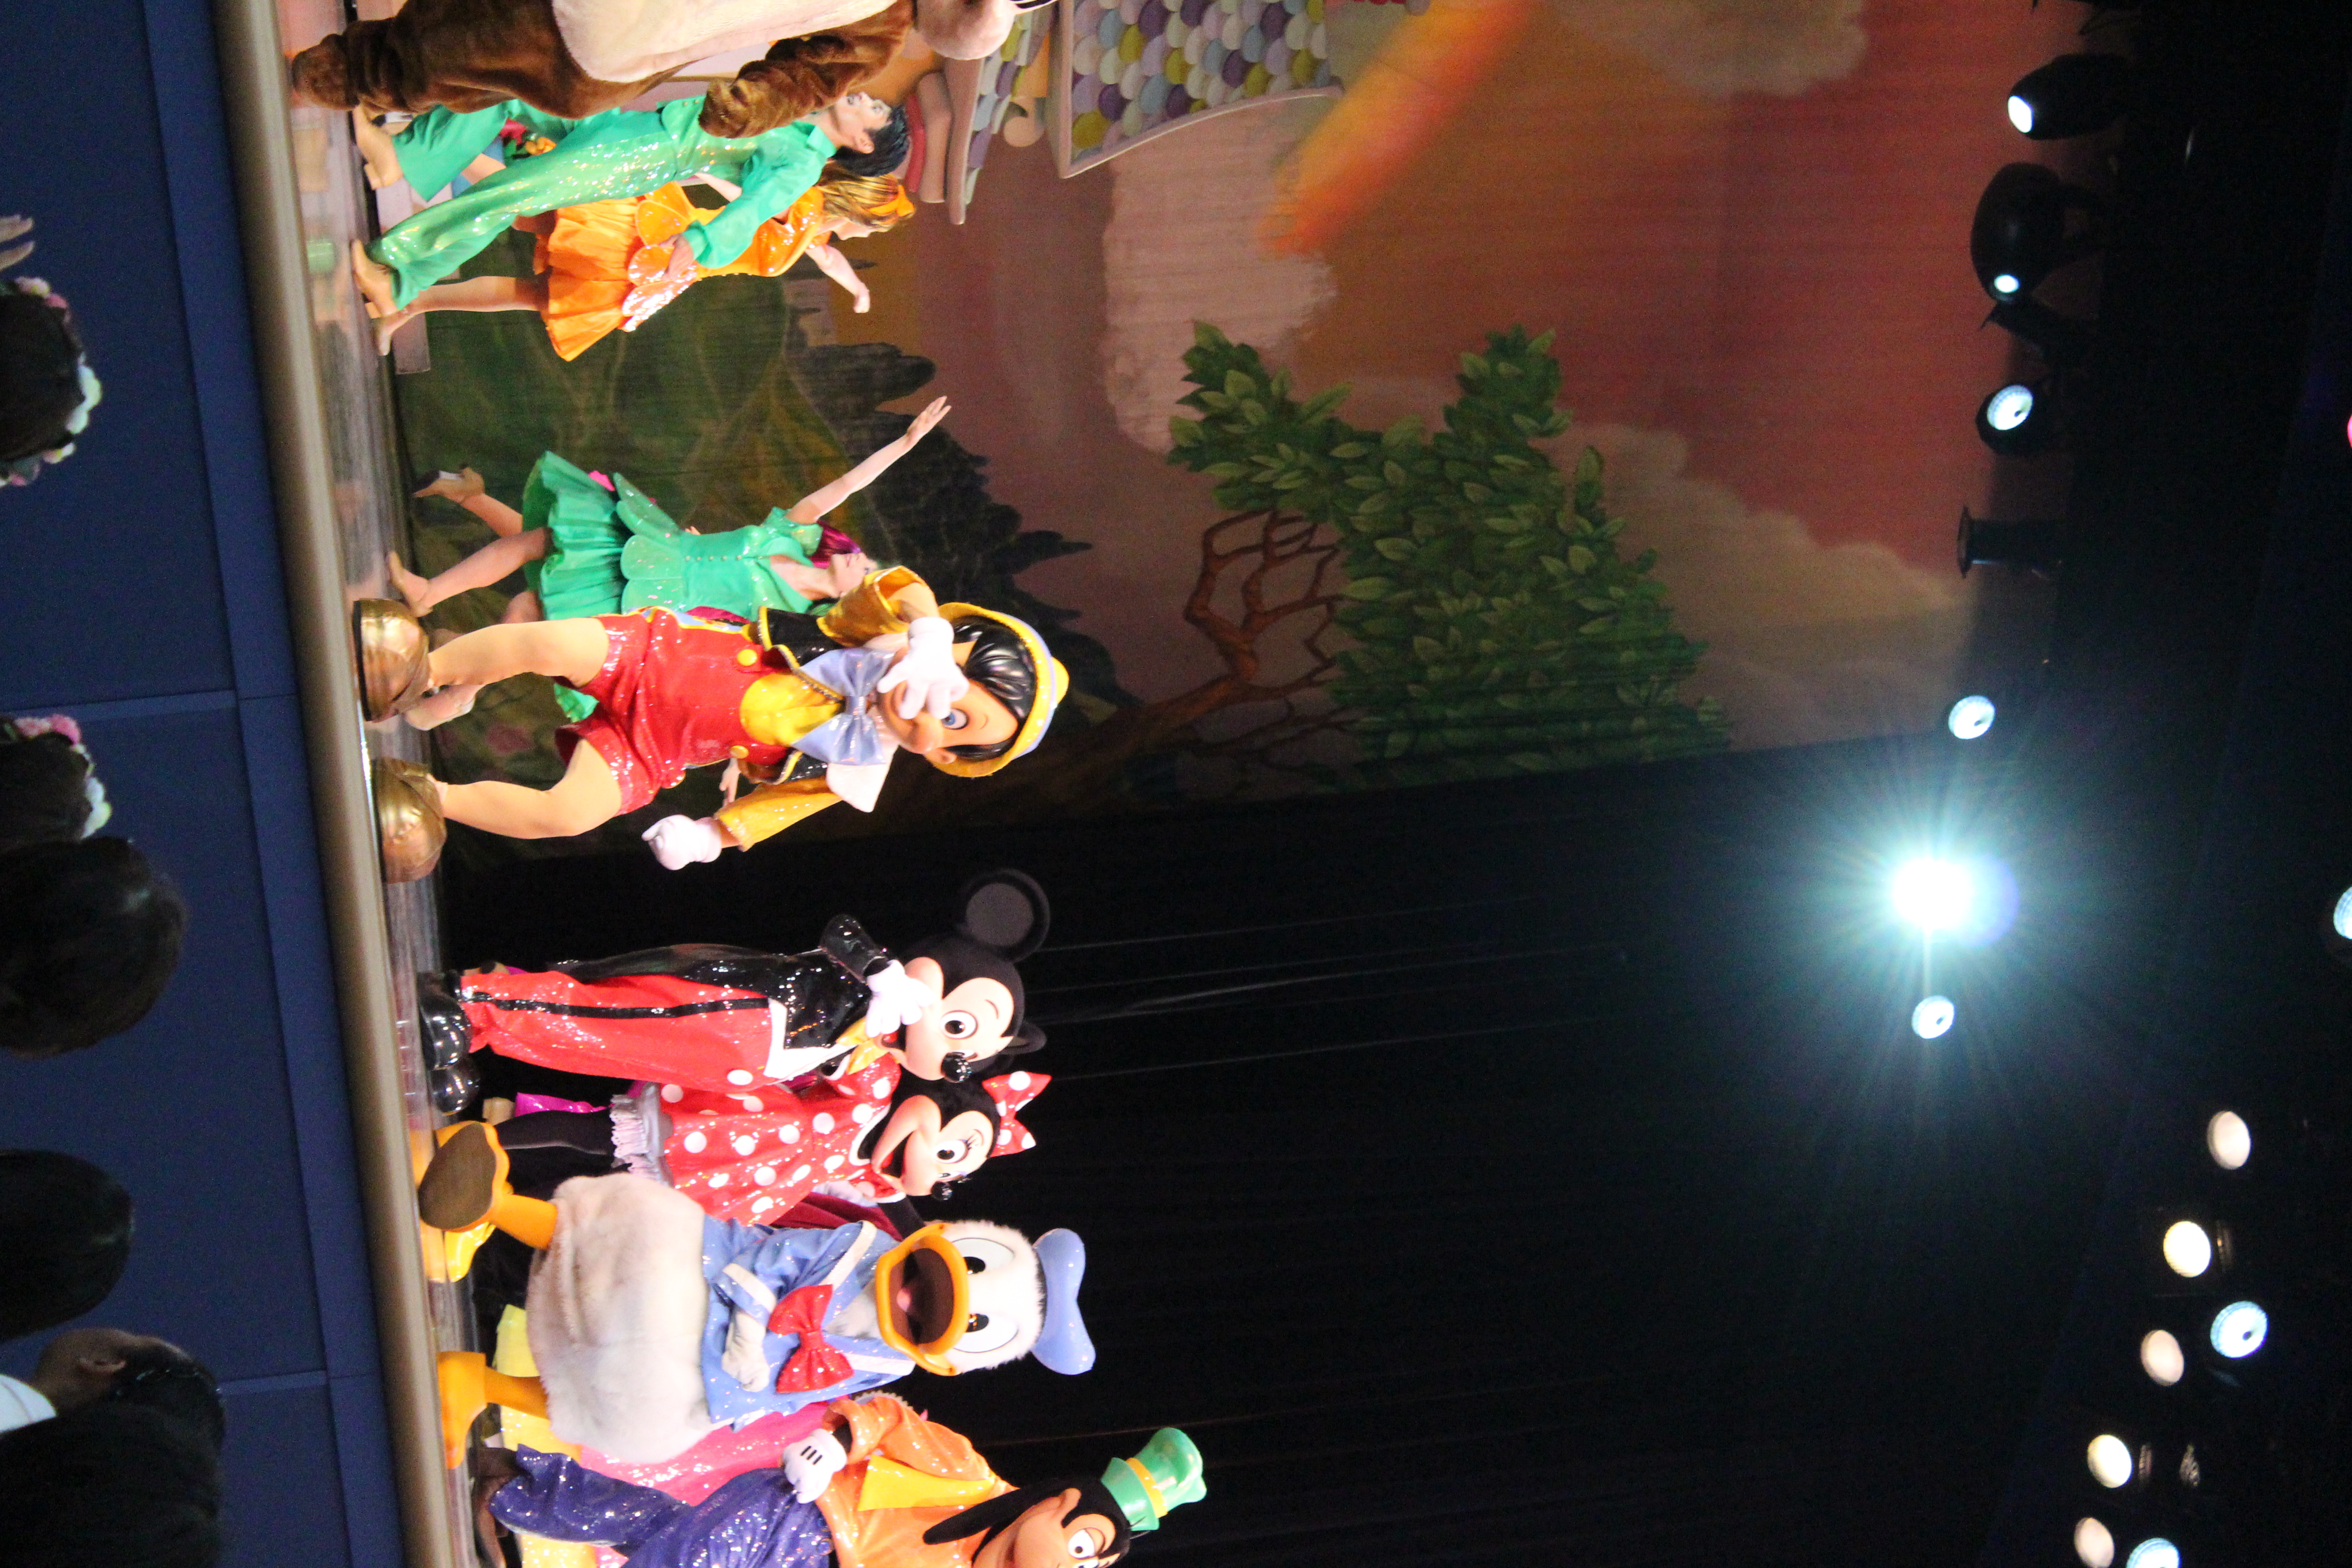 Pinocchio and Donald